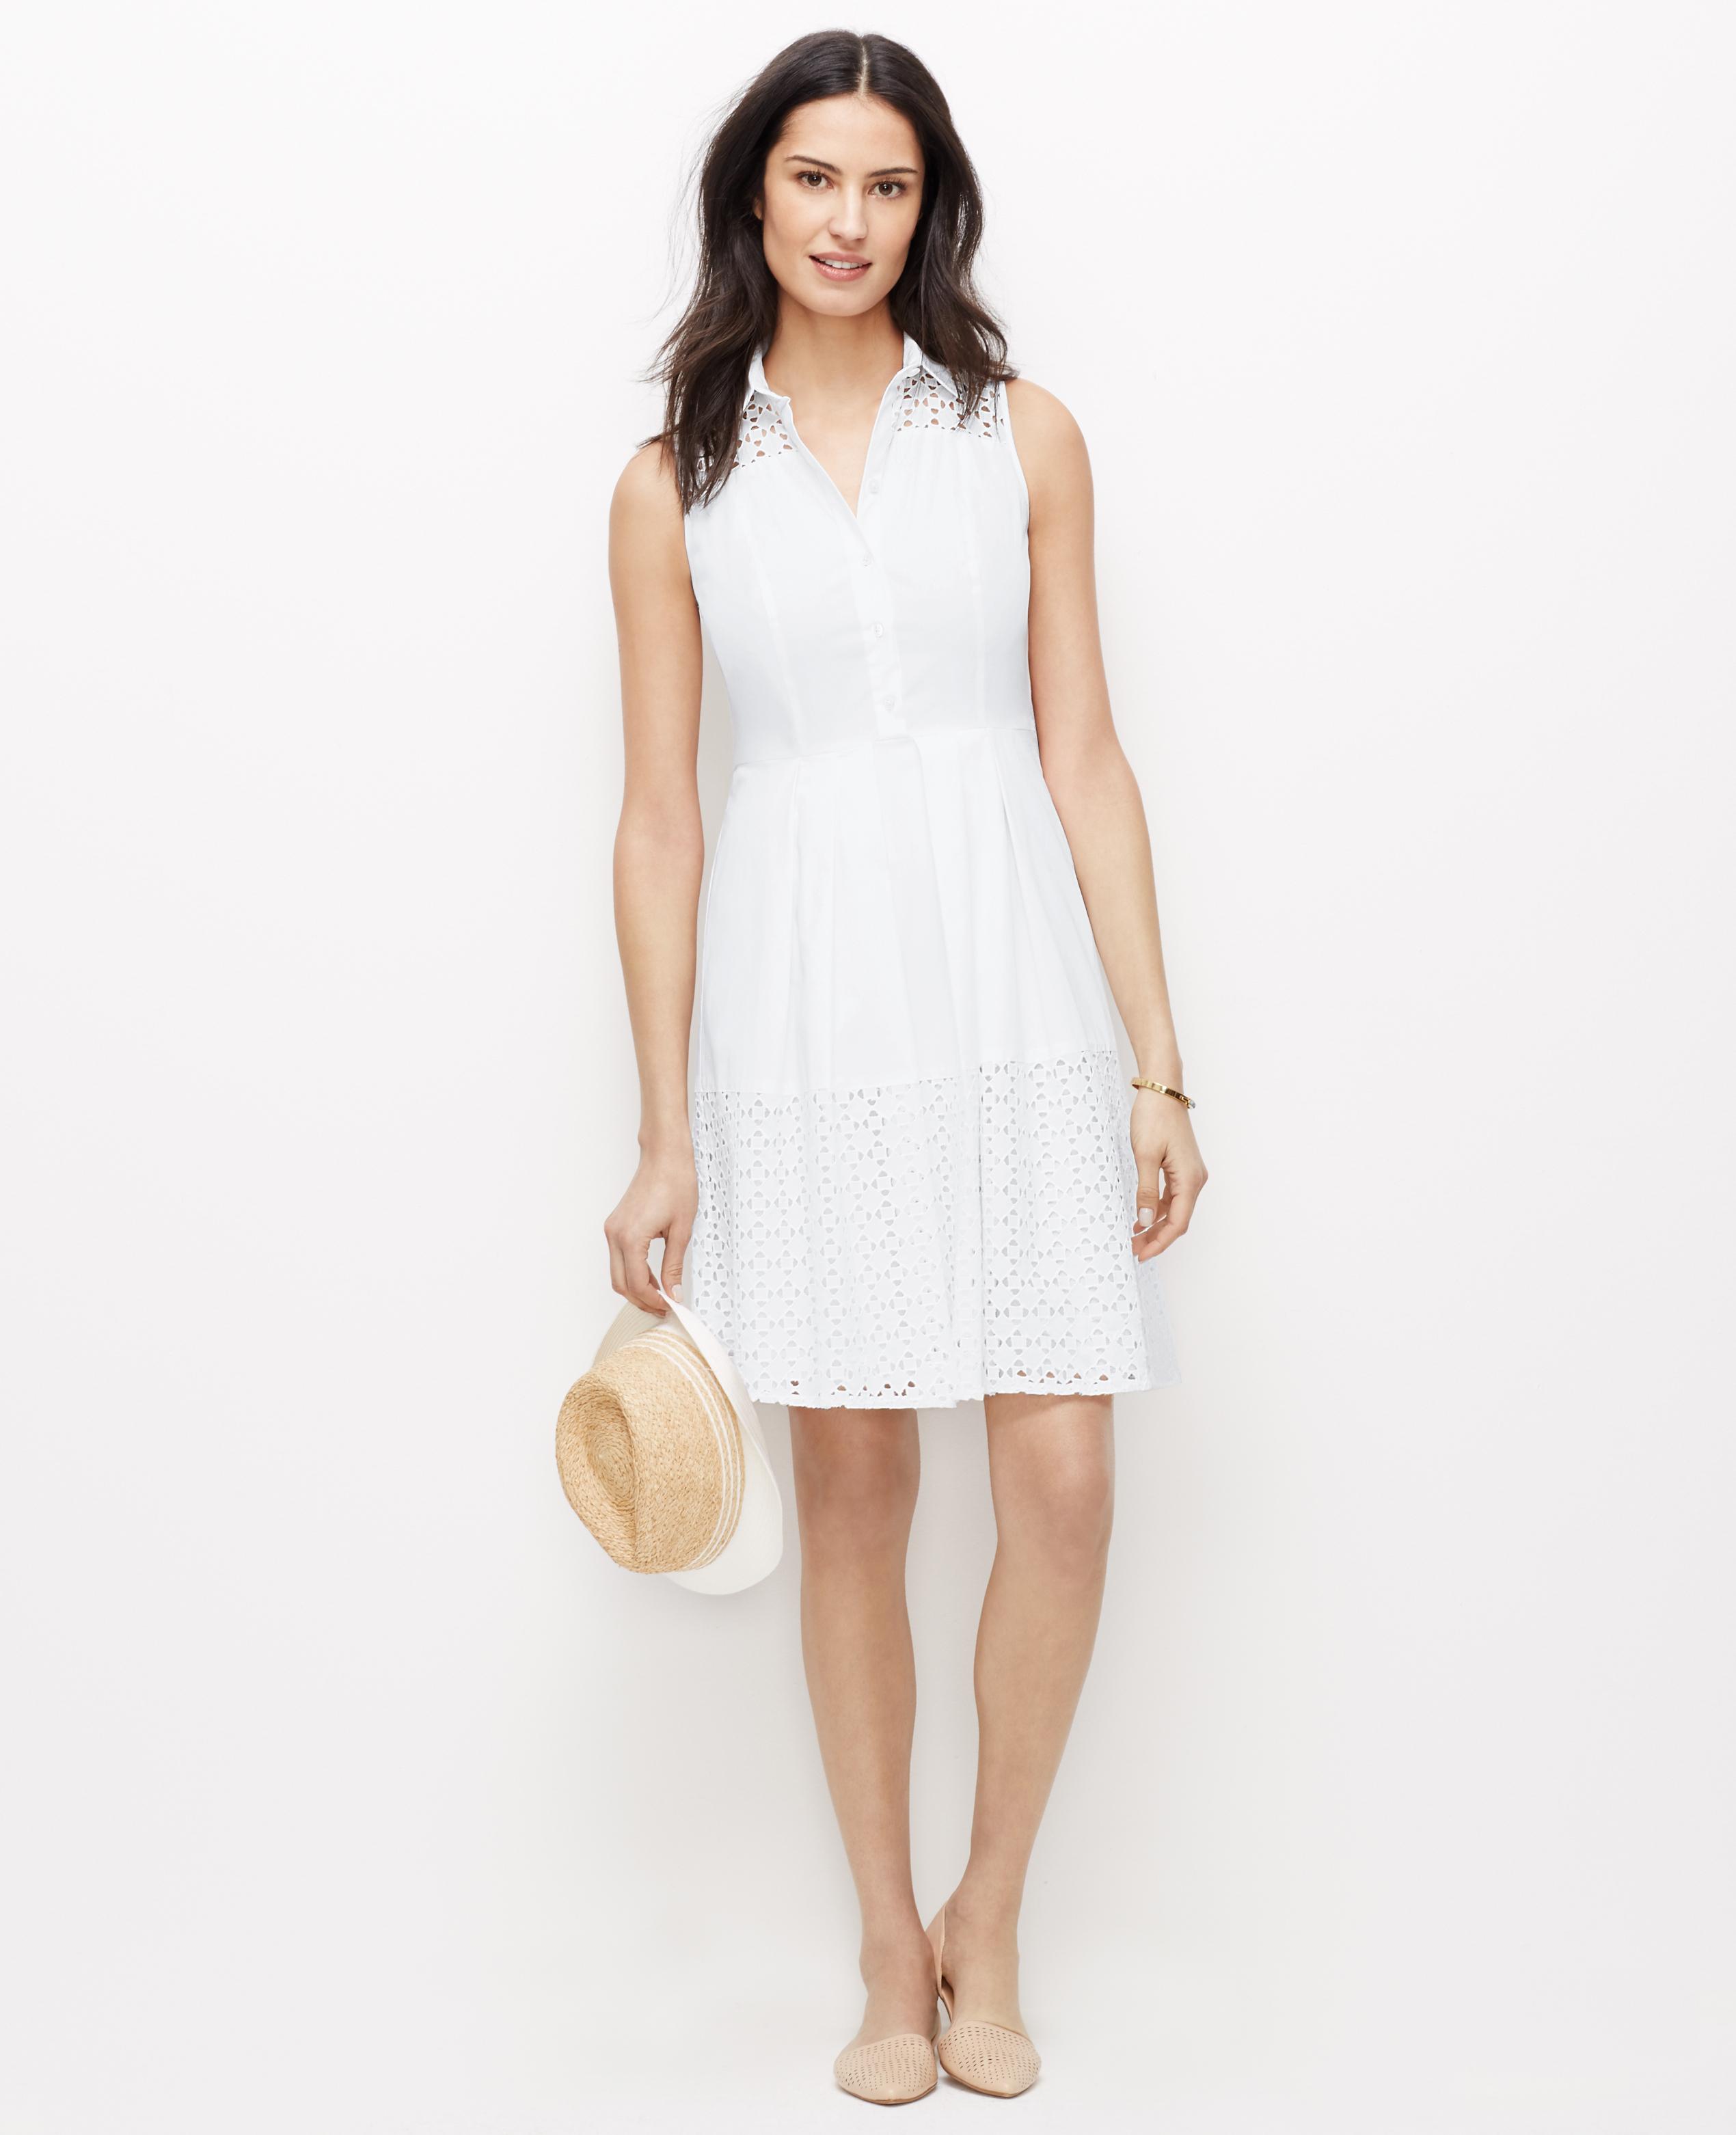 ba56c1320741 Lyst - Ann Taylor Petite Sleeveless Eyelet Shirtdress in White